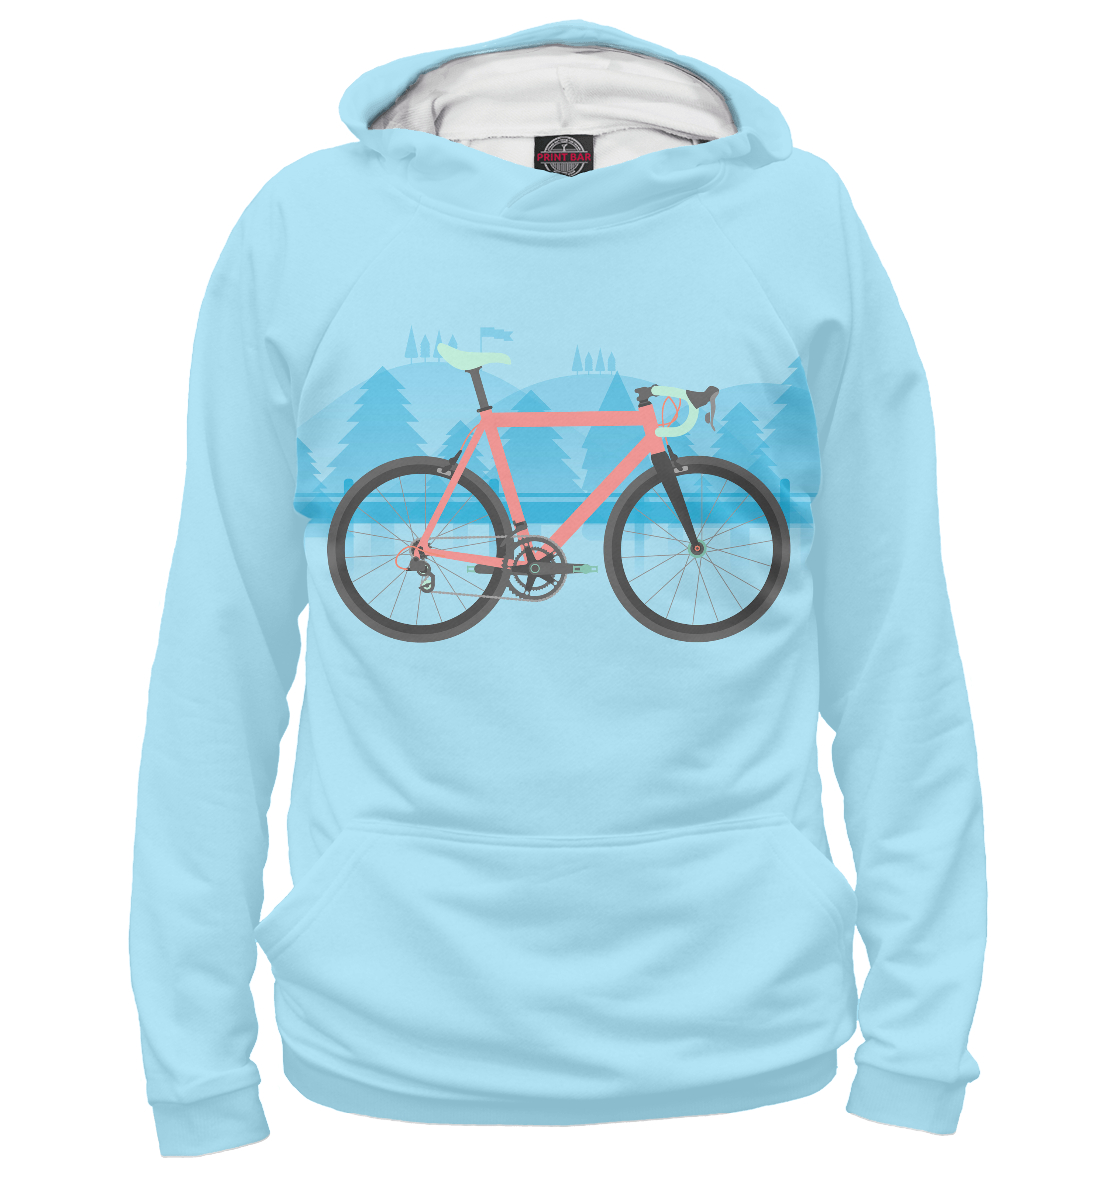 Фото - Велосипед велосипед foldx low step 2016